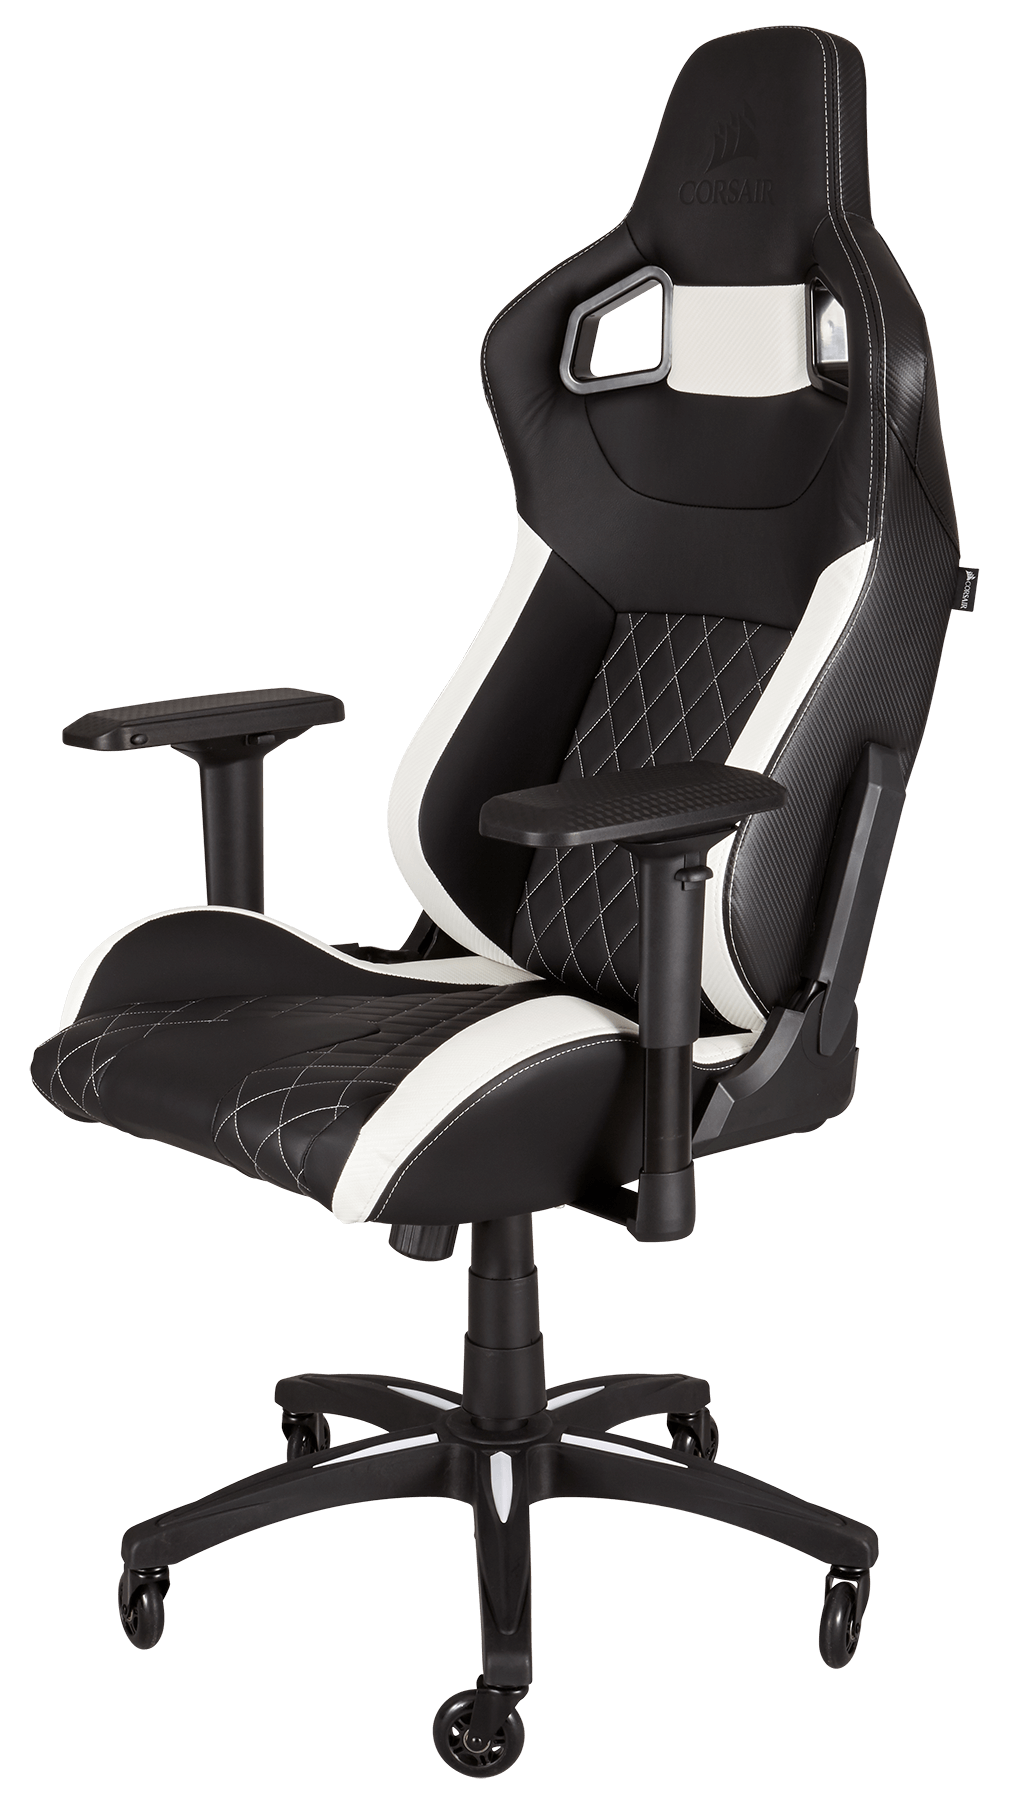 Køb Corsair Gaming T1 Race Gaming Stol SortHvid